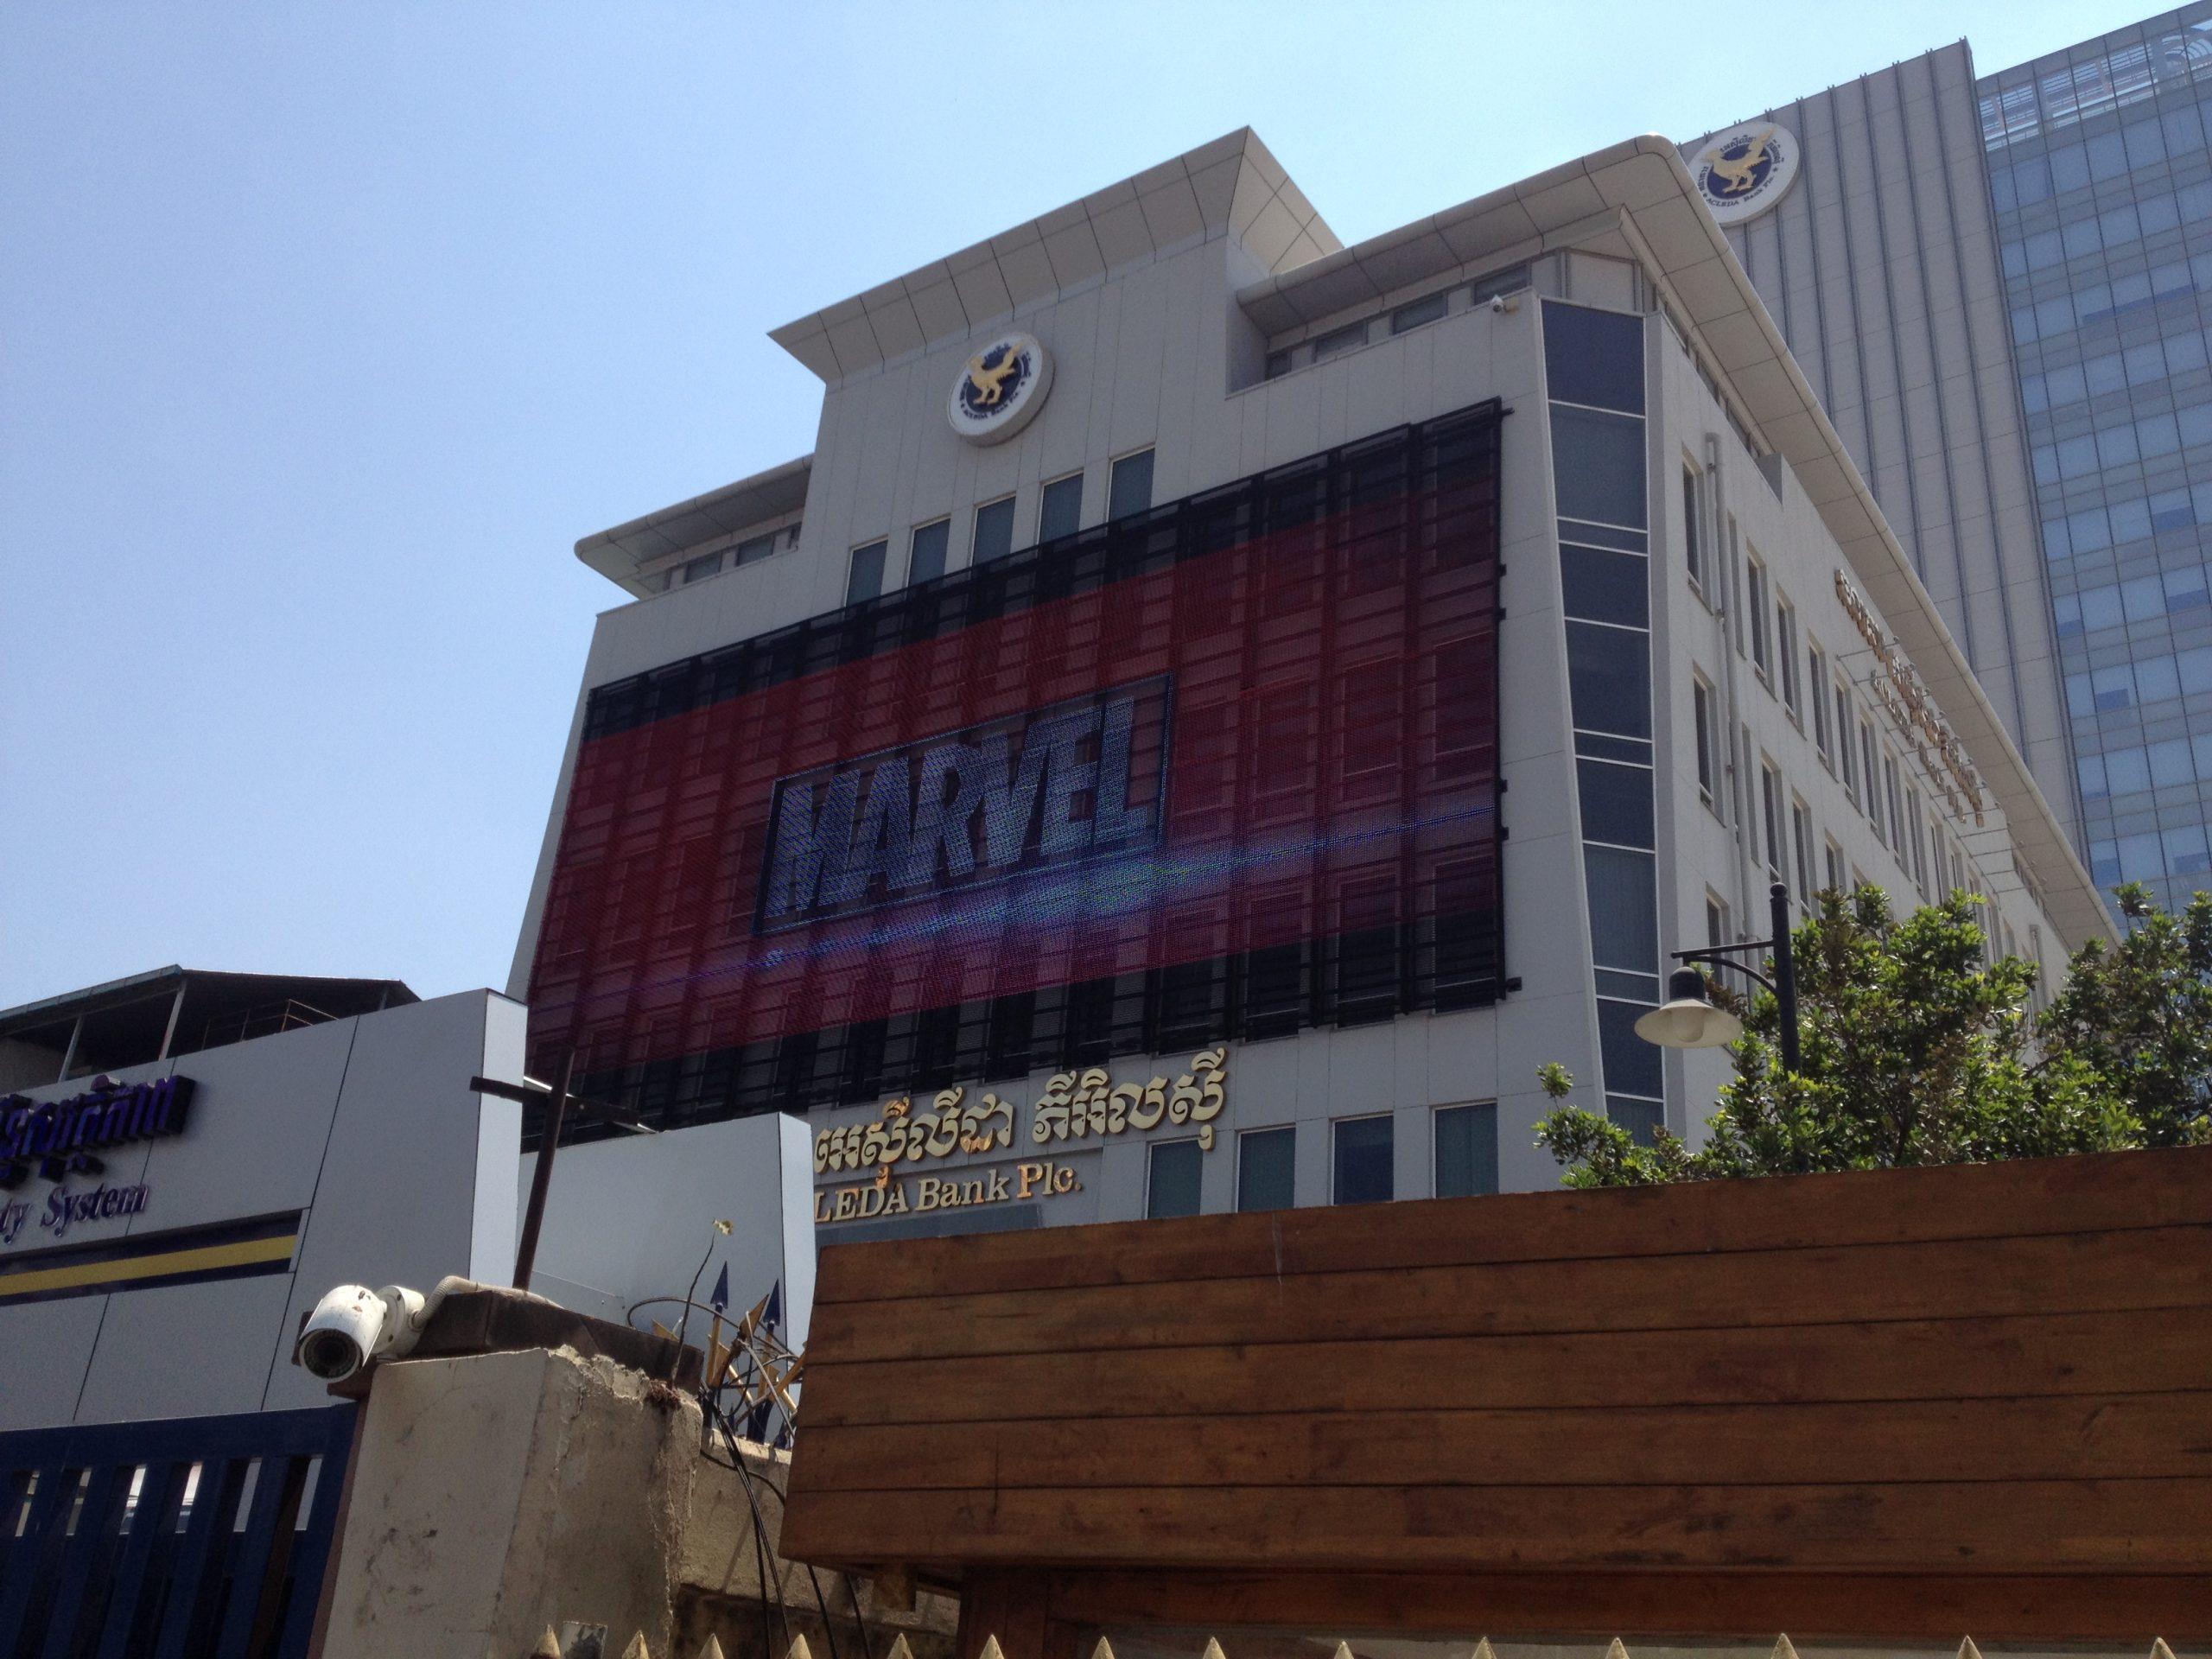 MF-P41mm-cambodia facade building